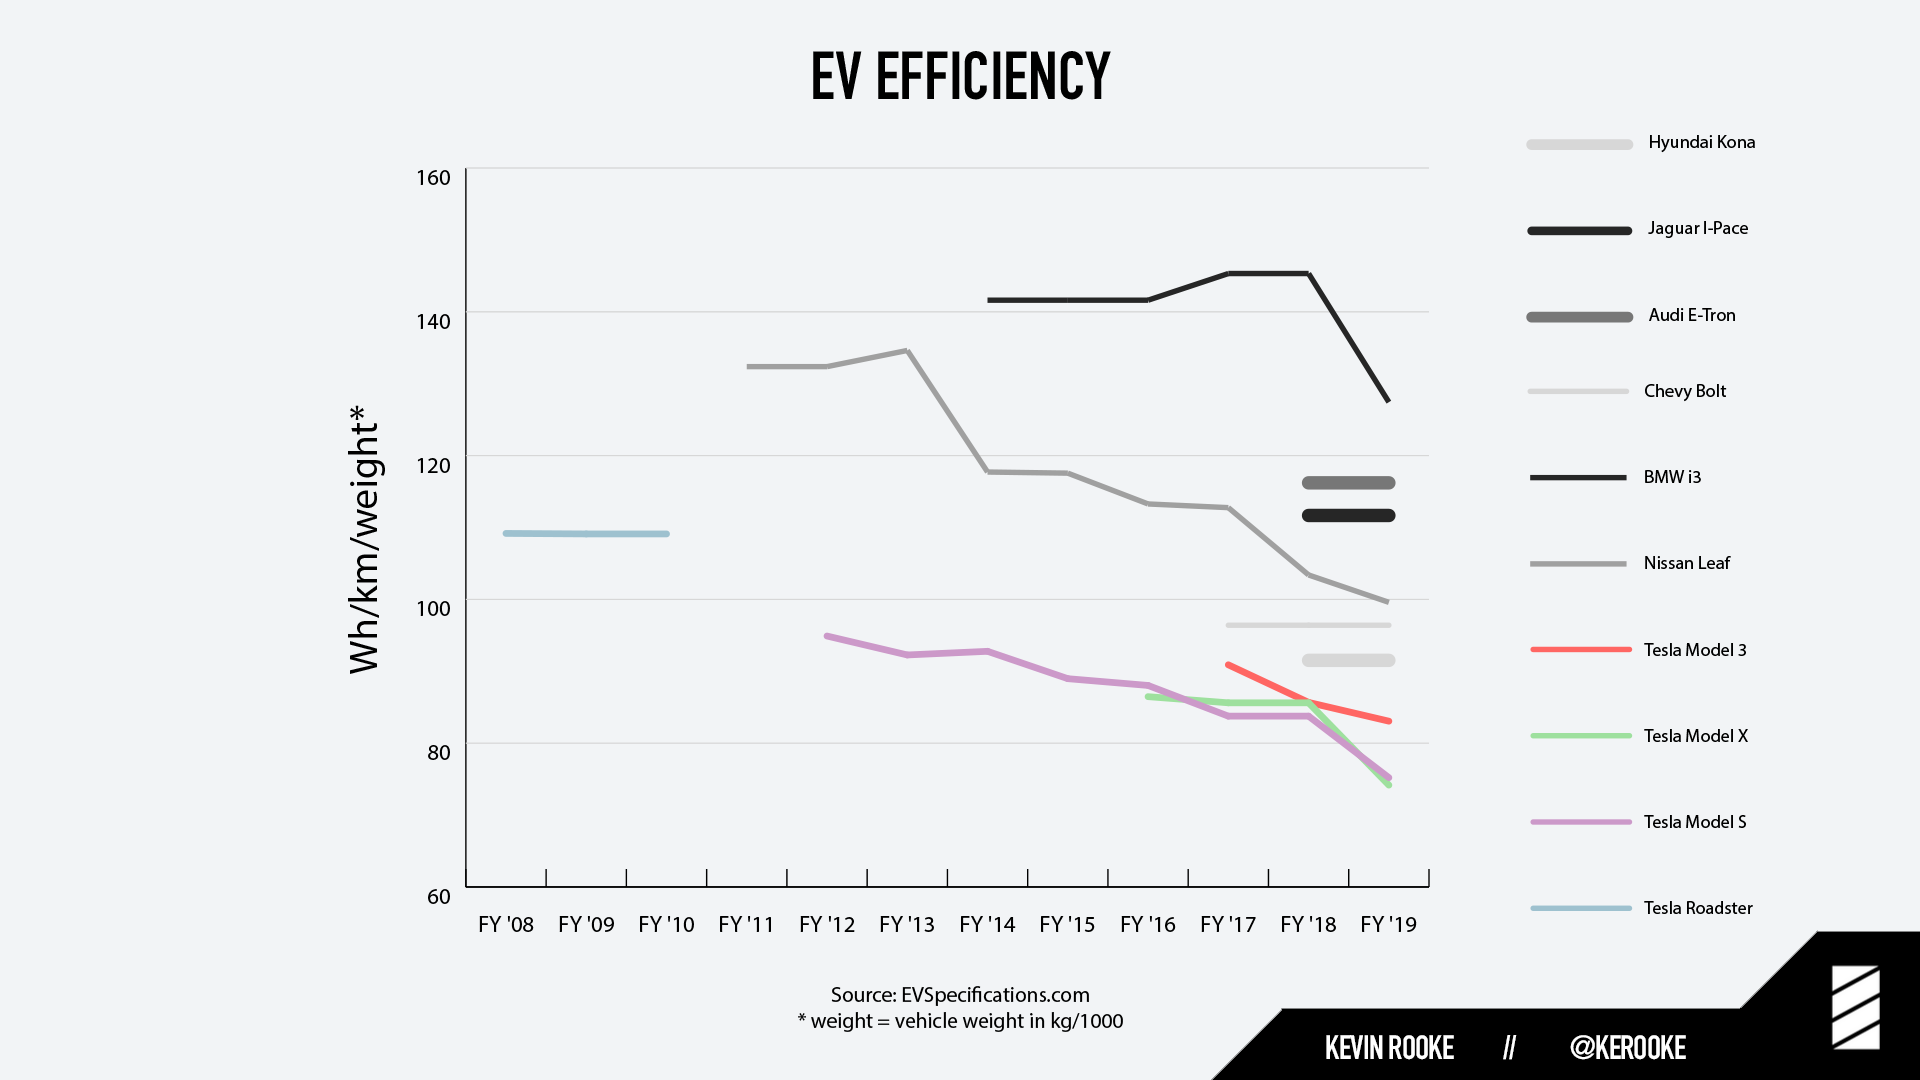 Comparing the efficiency of the Hyundai Kona, Audi E-Tron, and Jaguar I-Pace to Tesla cars